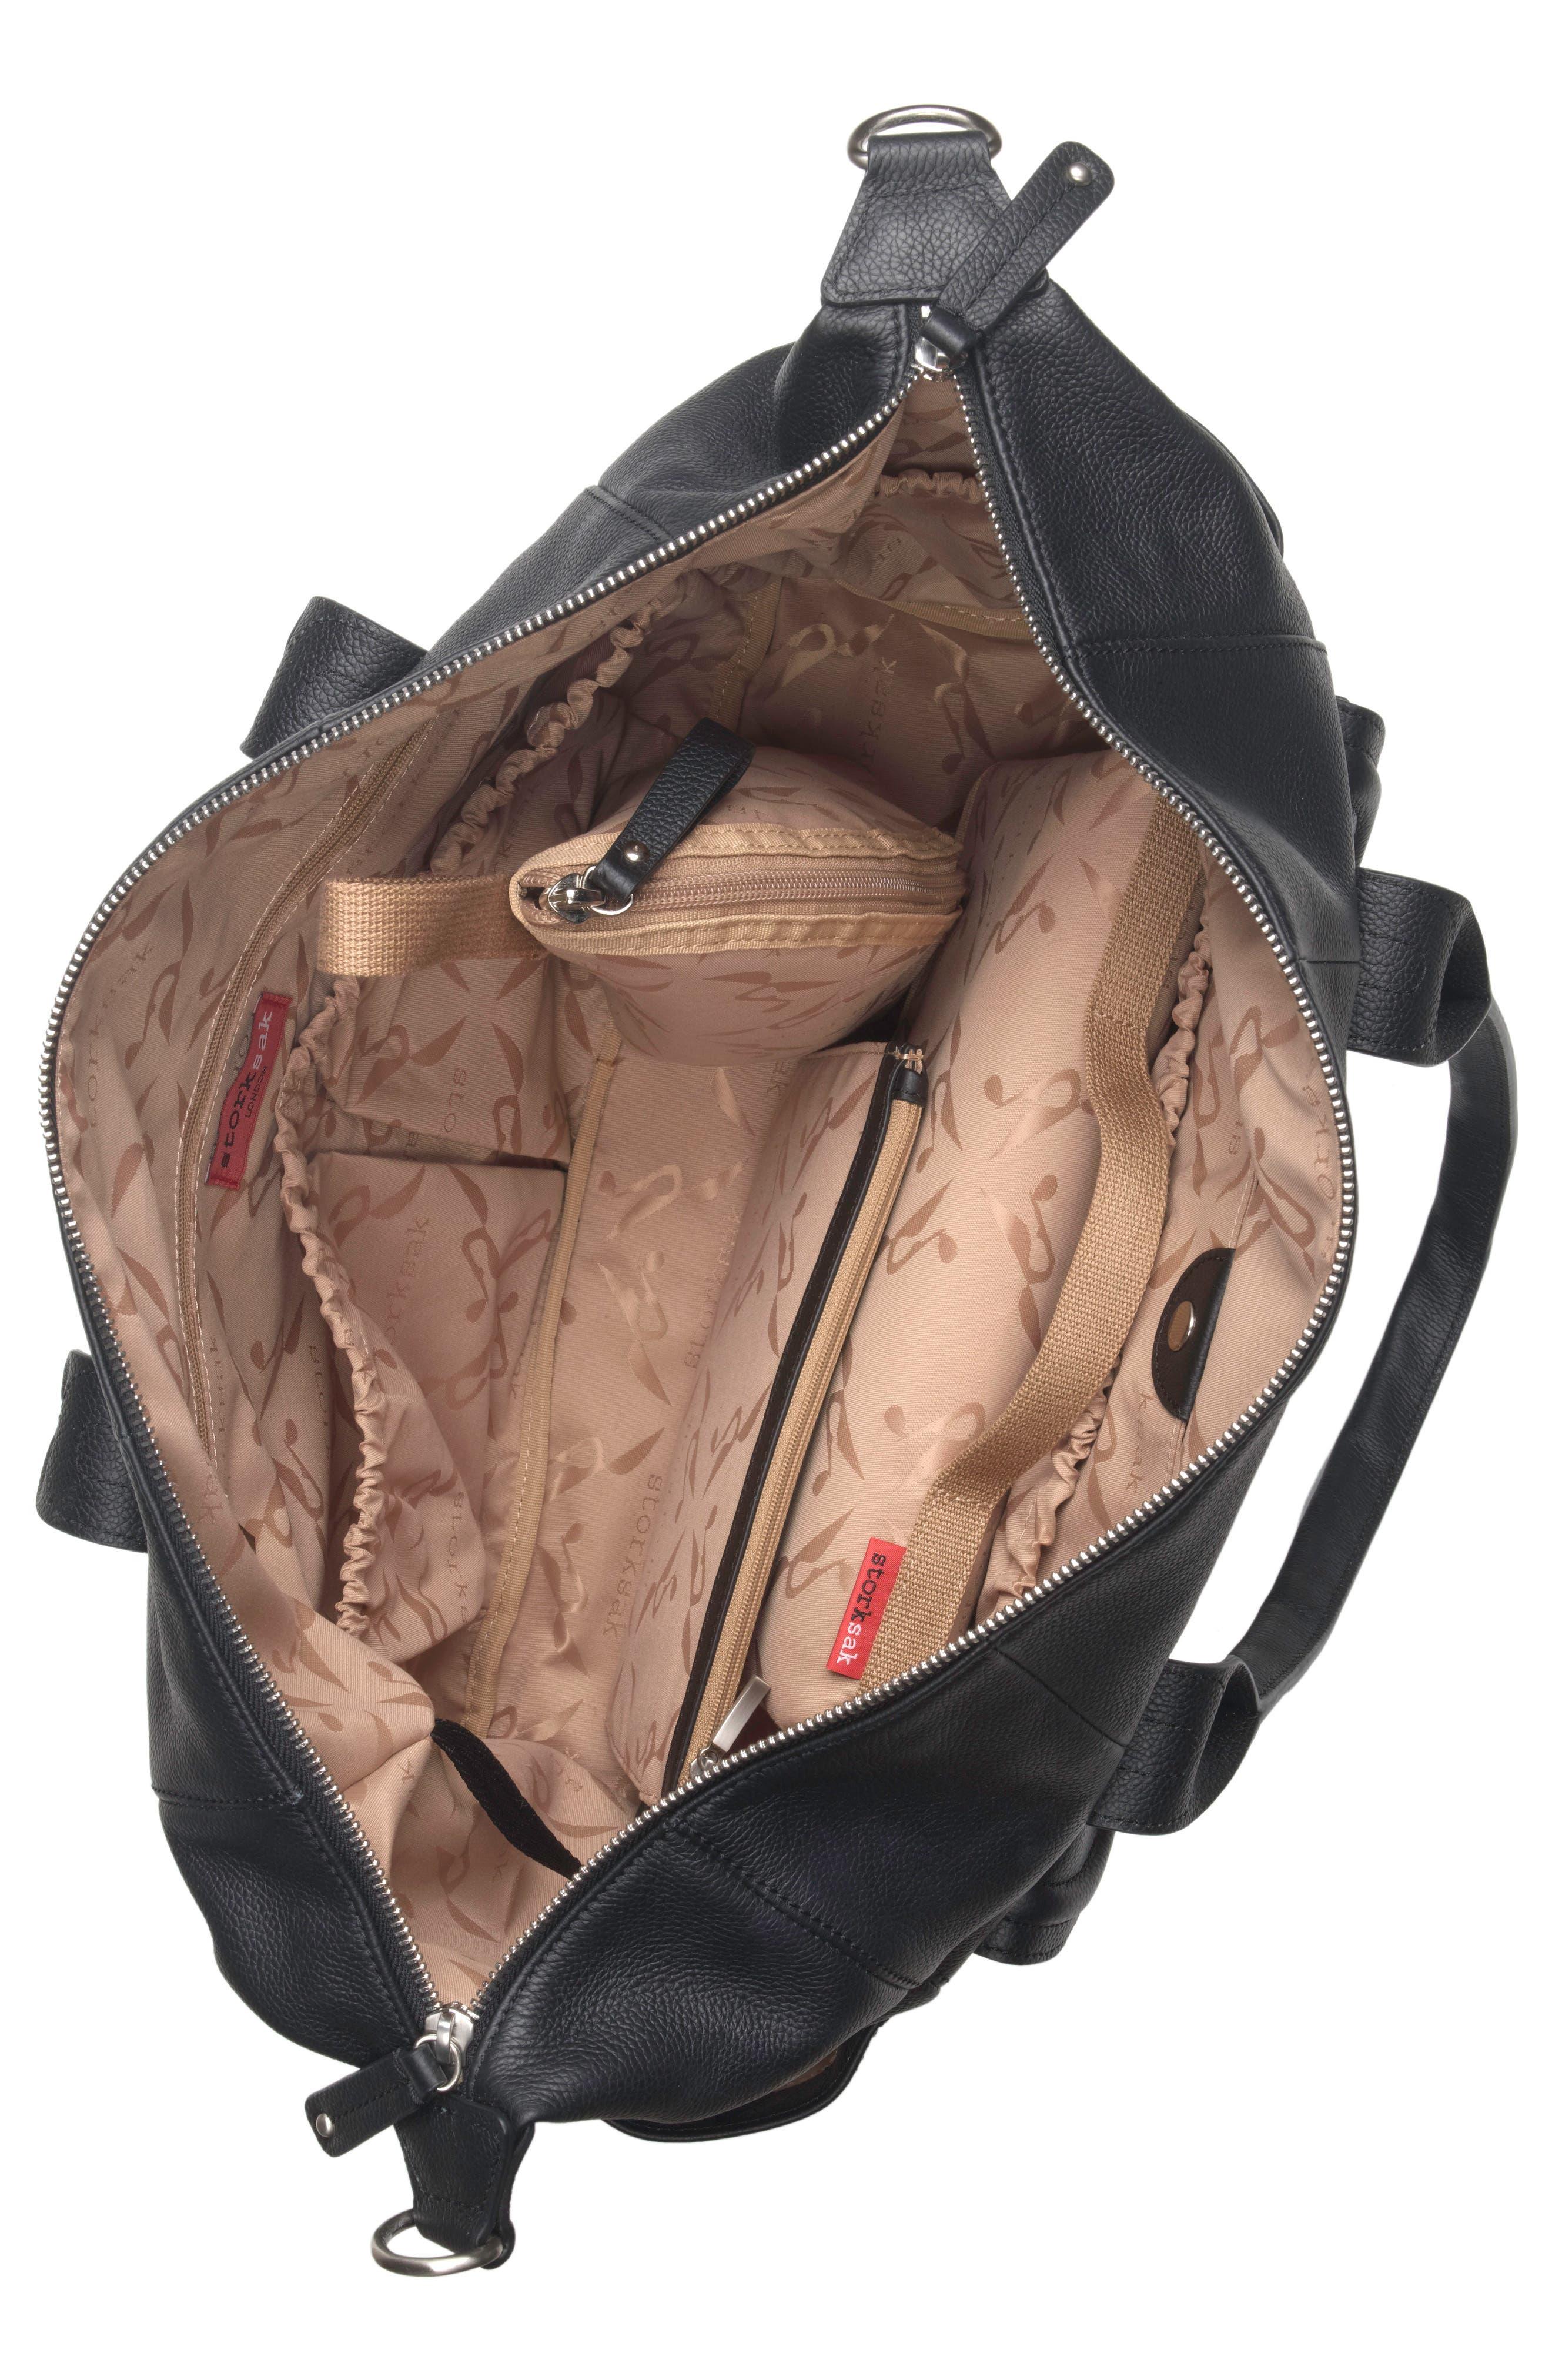 Storsak Leather Diaper Bag,                             Alternate thumbnail 6, color,                             BLACK